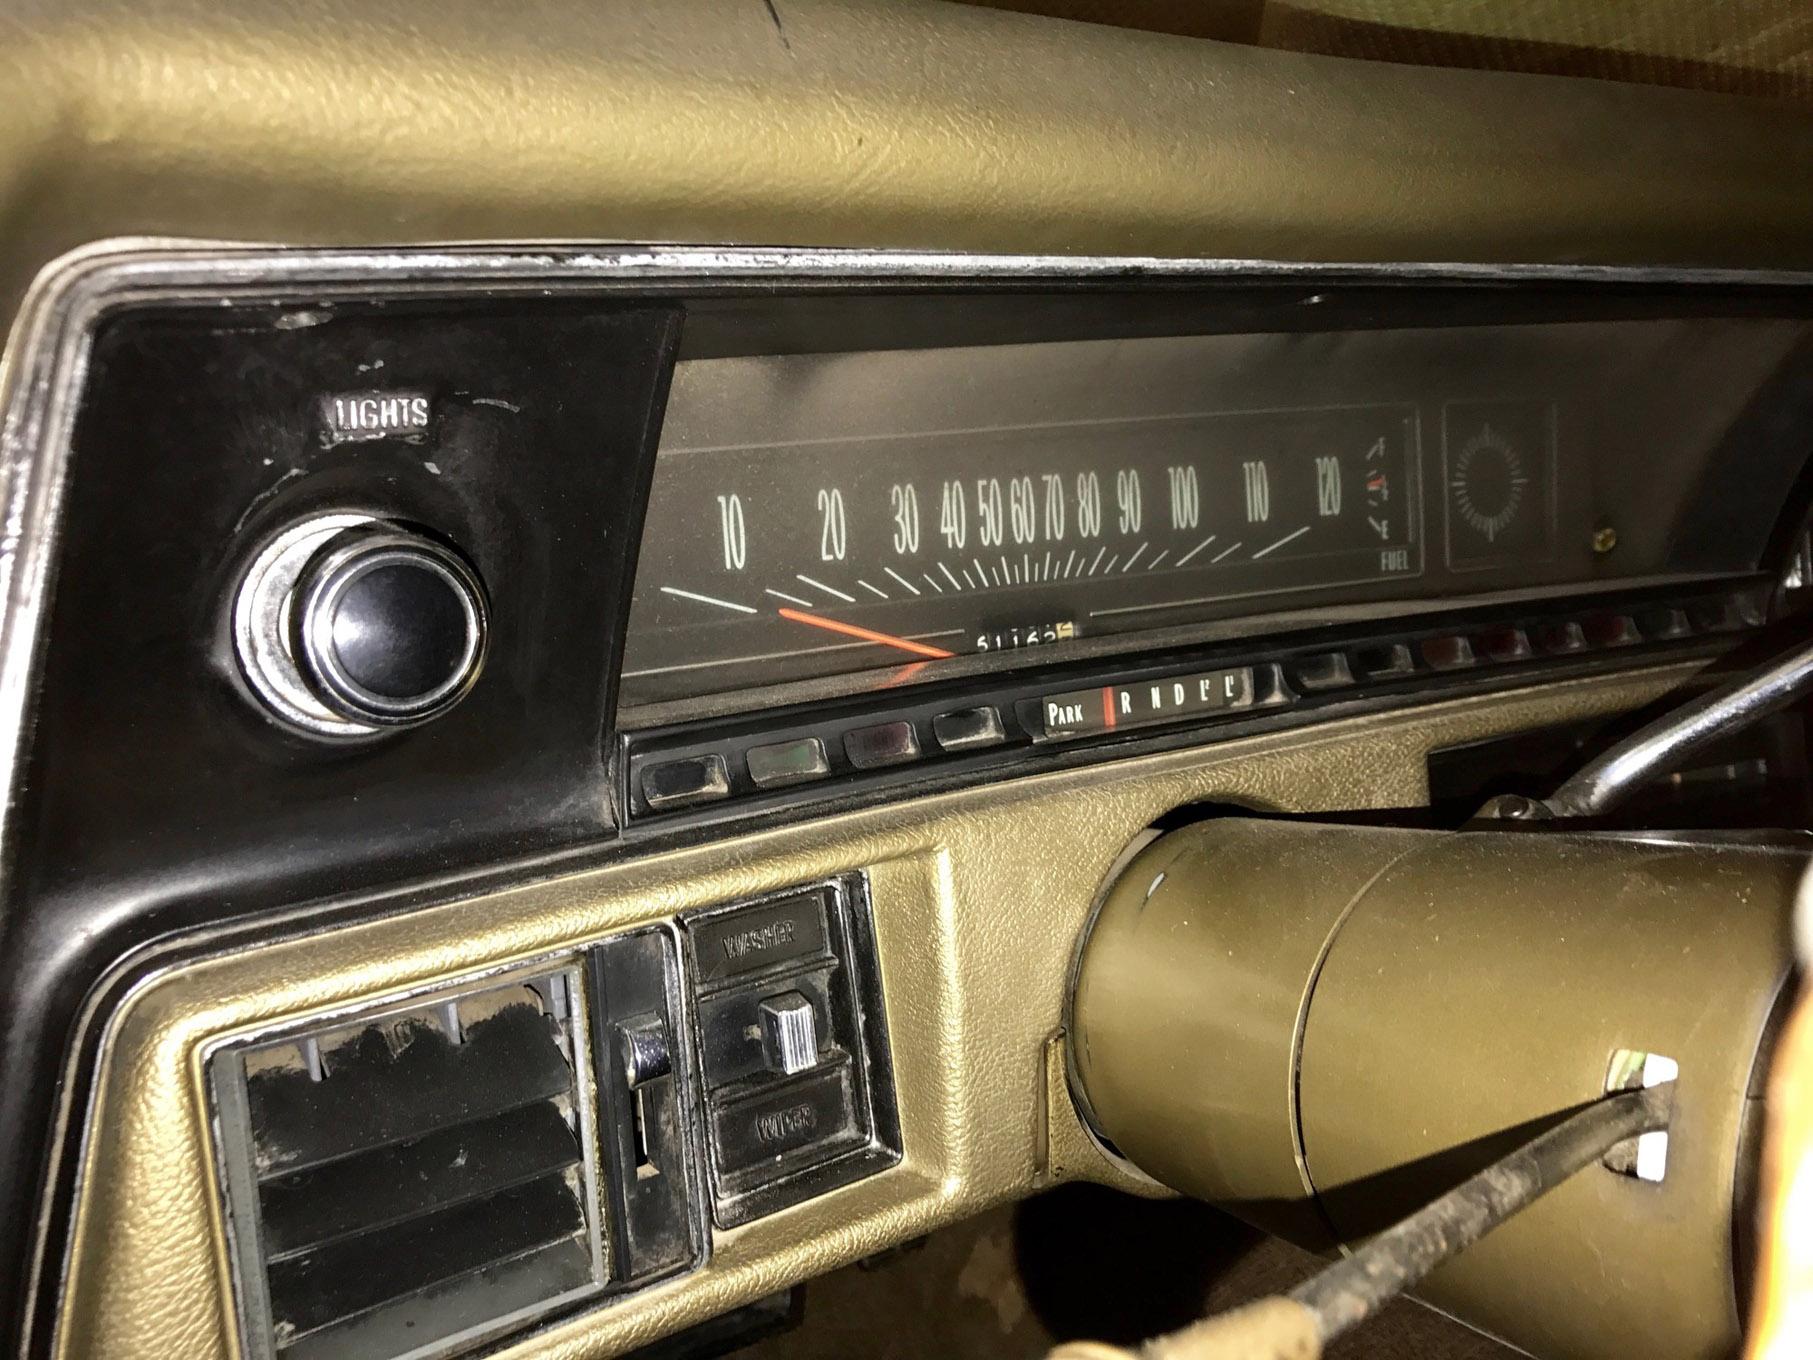 Br 3774 1972 Chevelle Air Conditioning Wiring Diagram Also 1972 Chevelle Dash Free Diagram